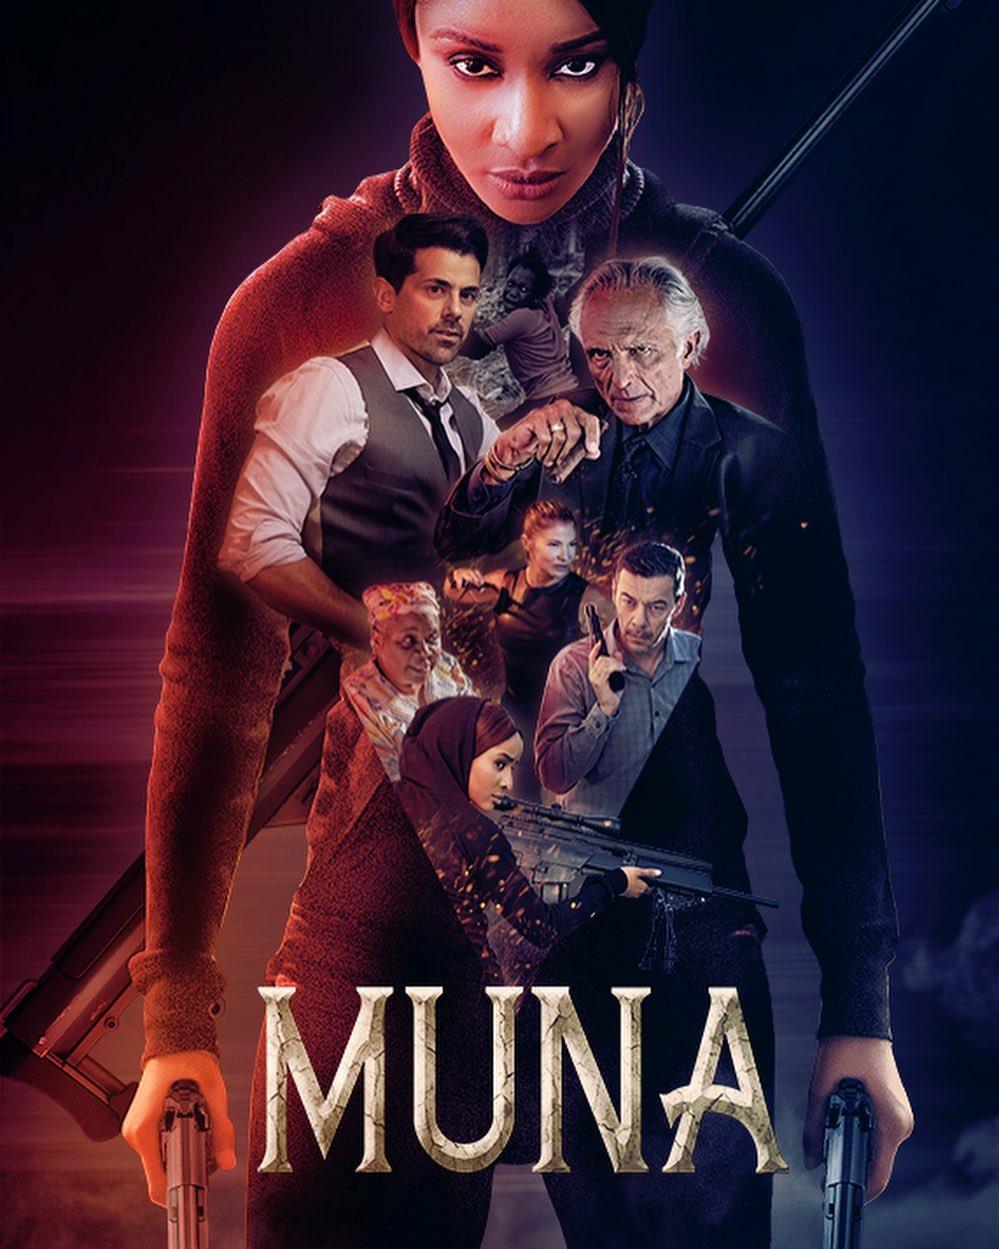 'muna' Suggests New Career Angle For Adesua Etomi Wellington